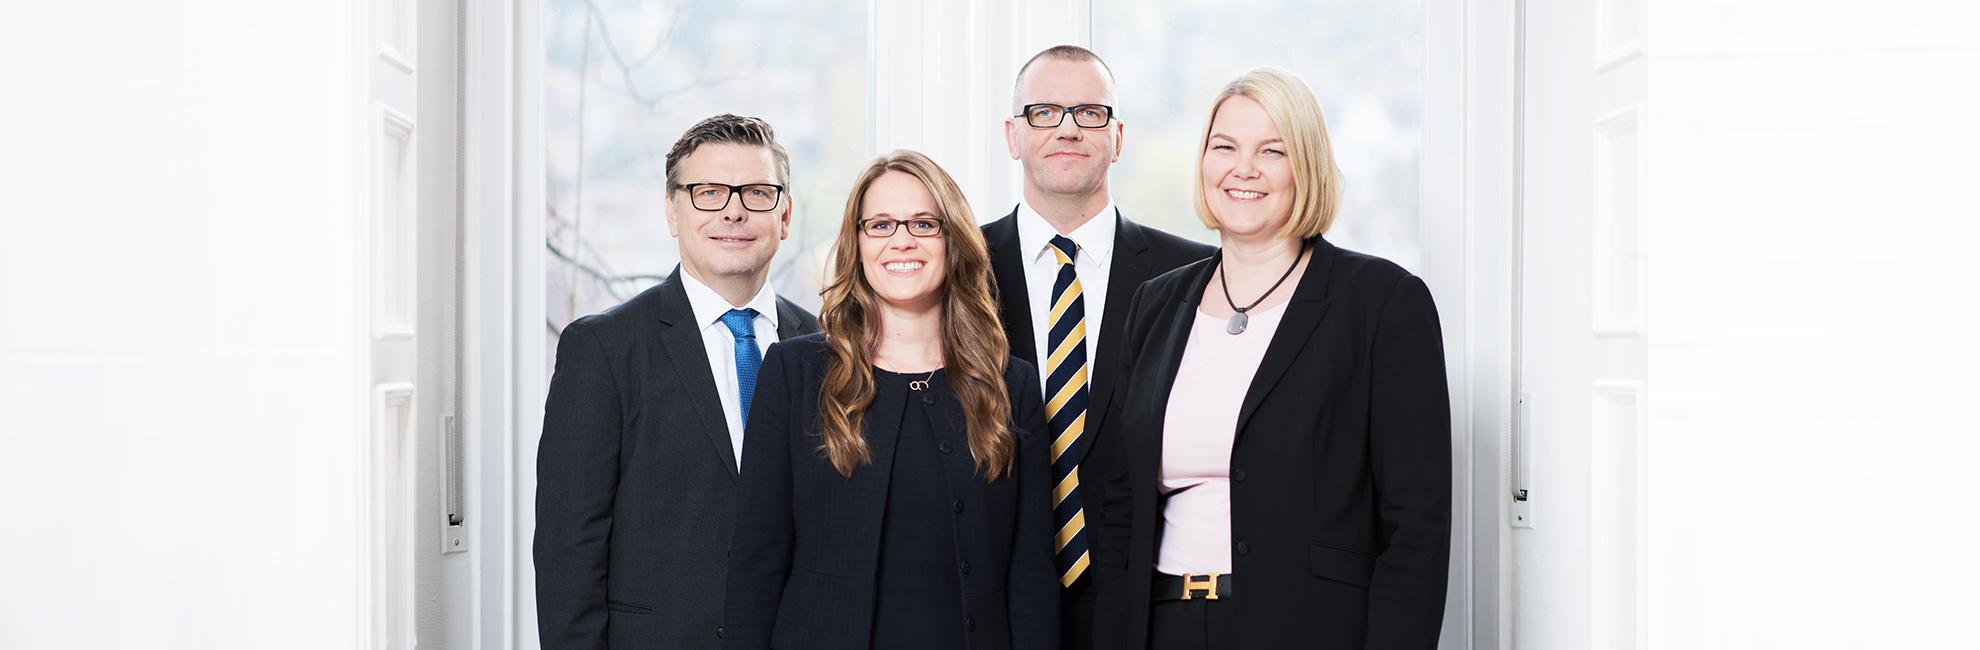 Das AVANTCORE Team in Stuttgart. Von links nach rechts: Dr. Arnd Pannenbecker, Rebekka Stumpfrock, Dr. Matthias Hesshaus, Dr. Julia Blind